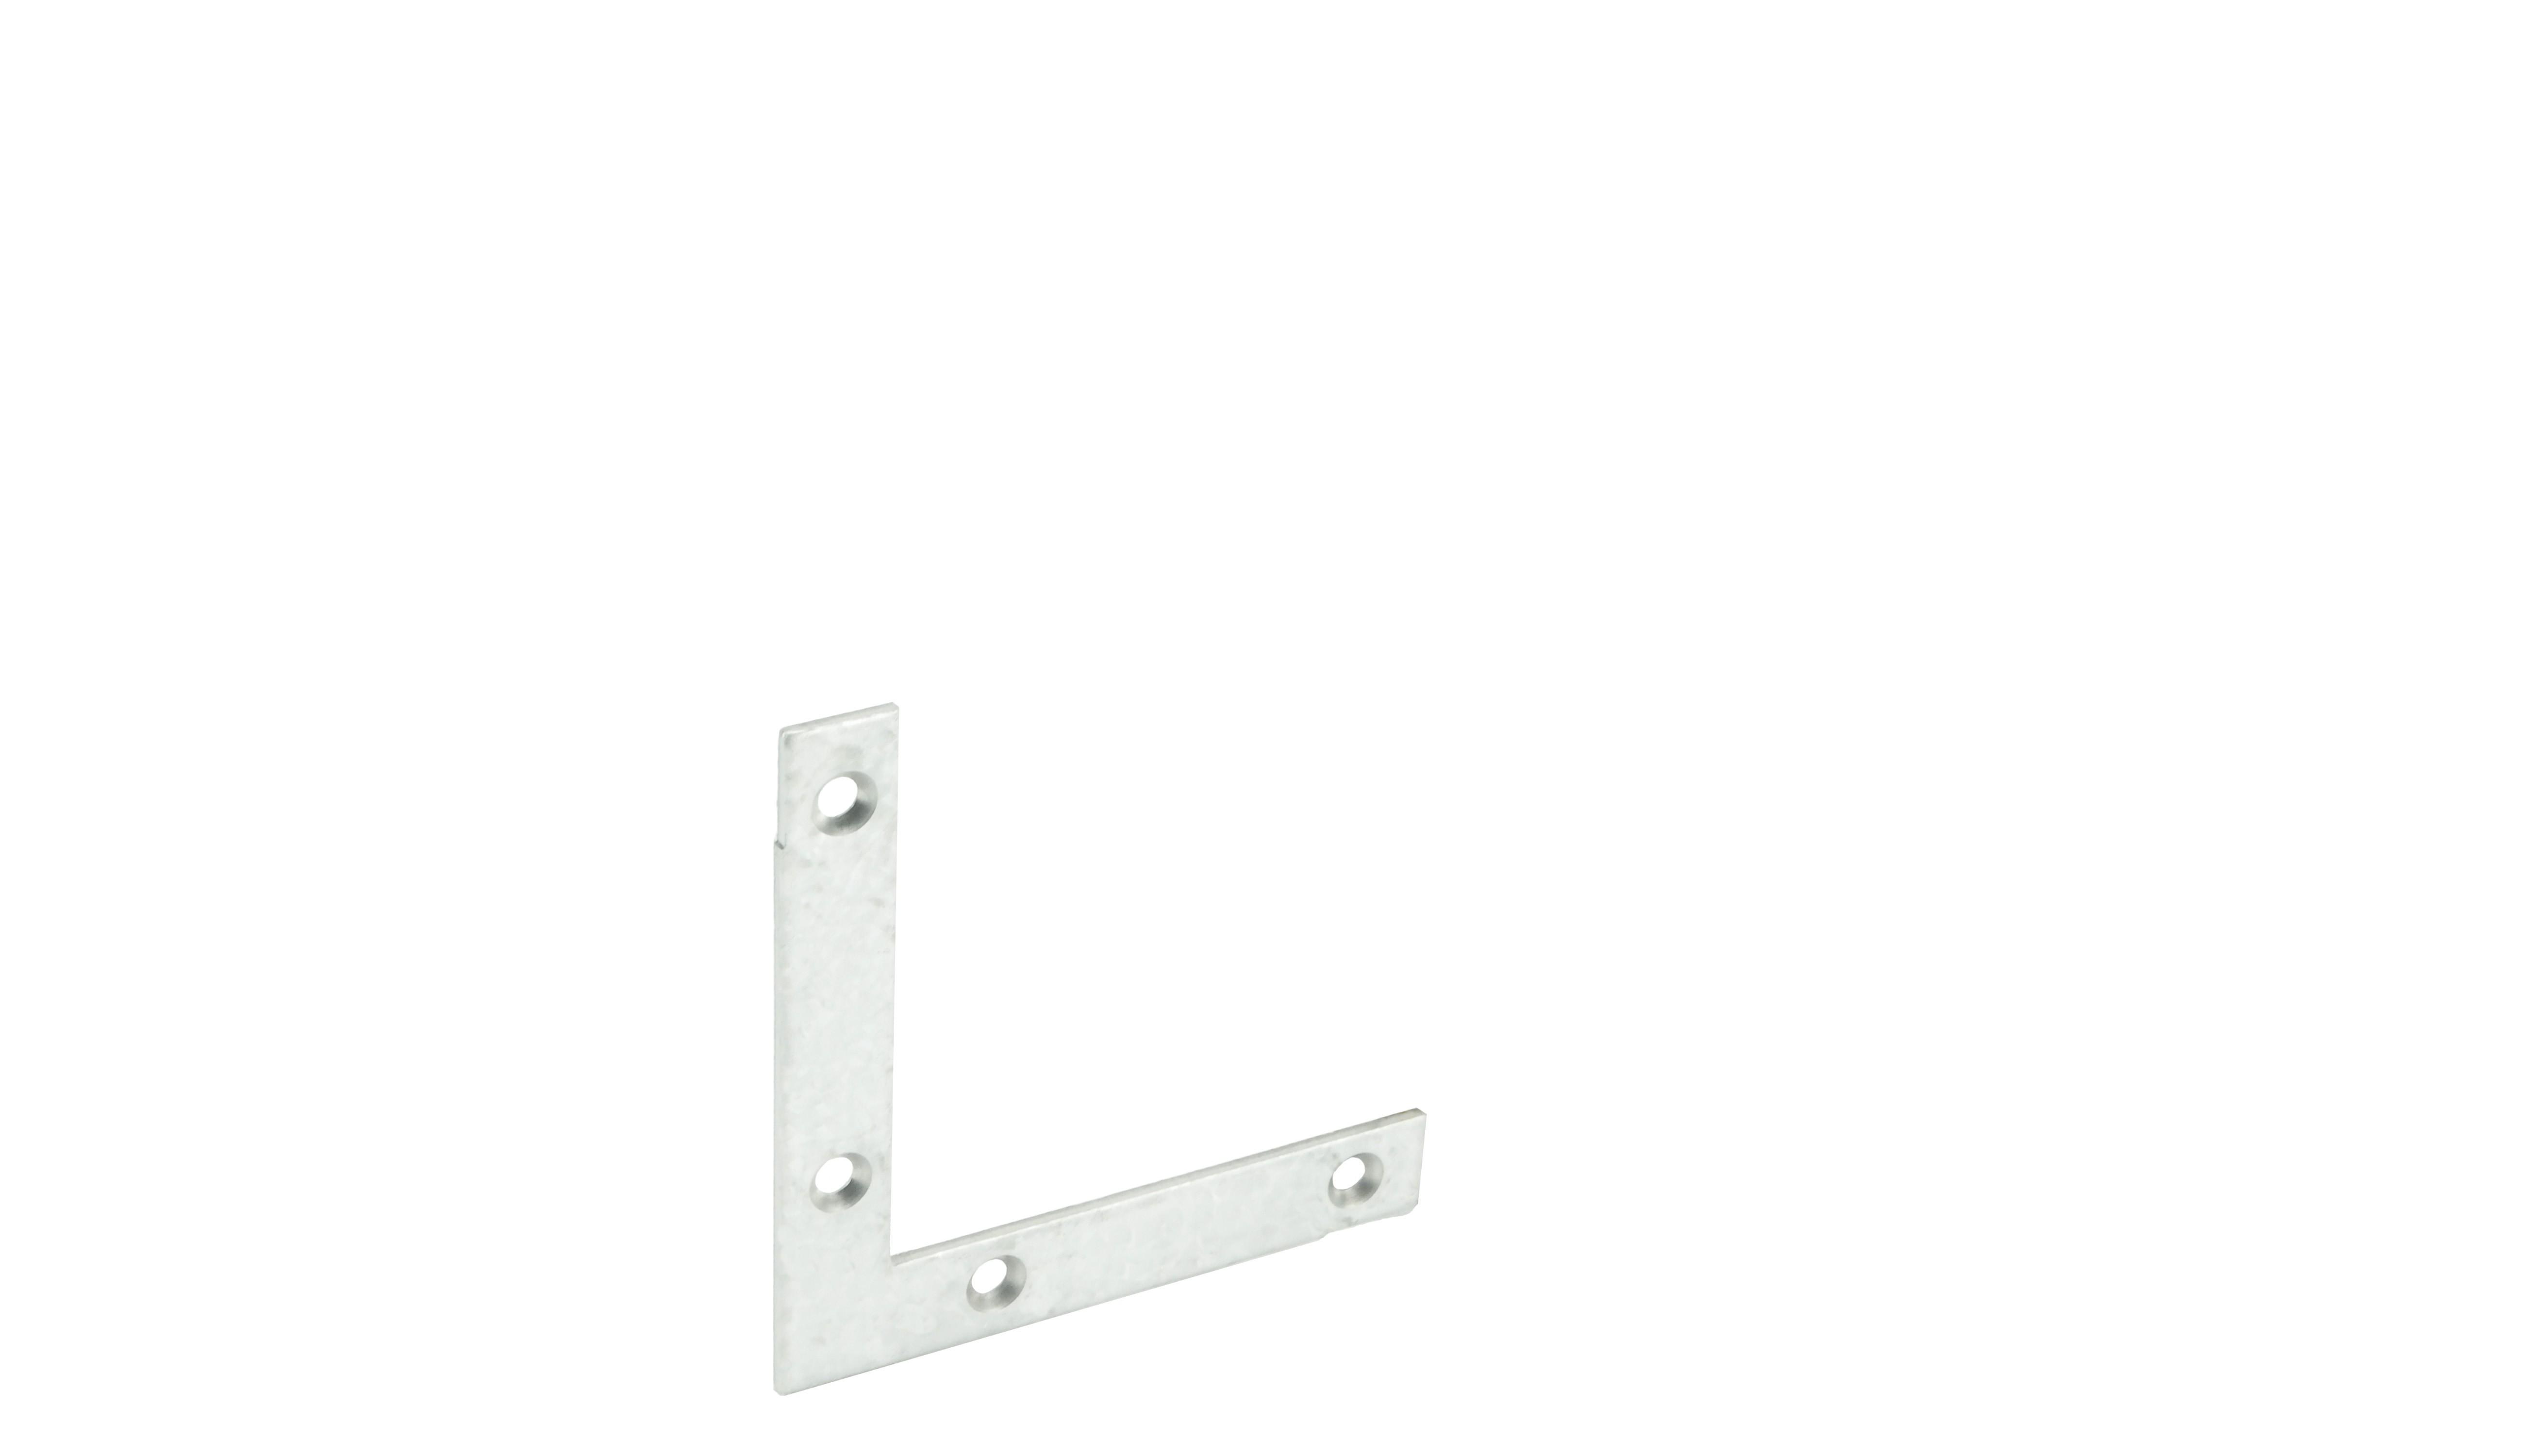 Flat corner iron flat 60x60 10x1,5 GA